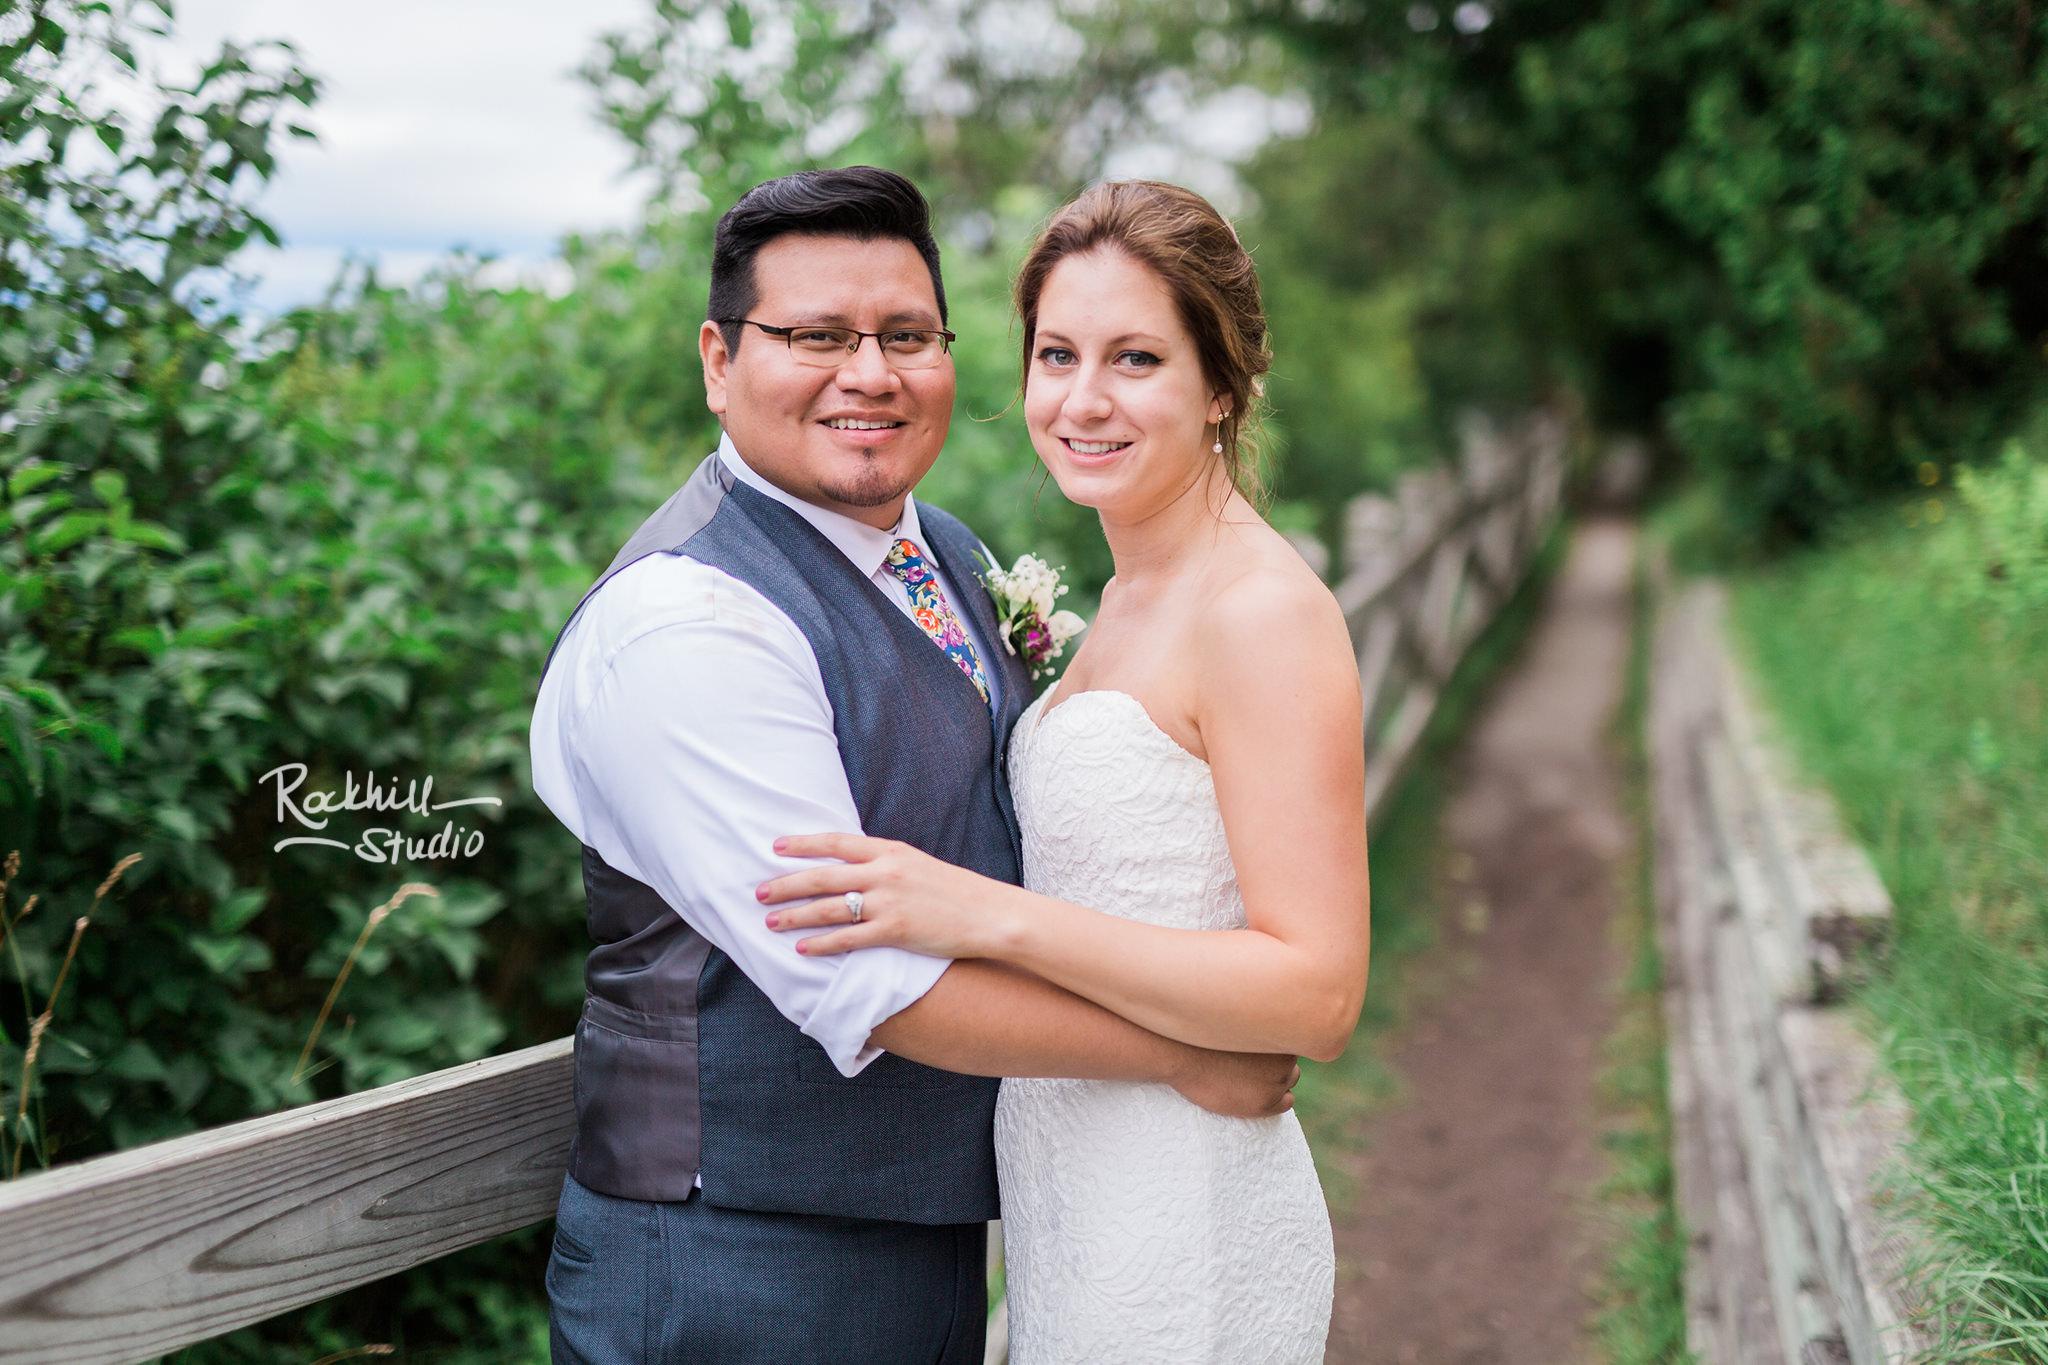 Mackinac Island Wedding, Traverse City wedding photographer Rockhill Studio, Inn at Stonecliffe